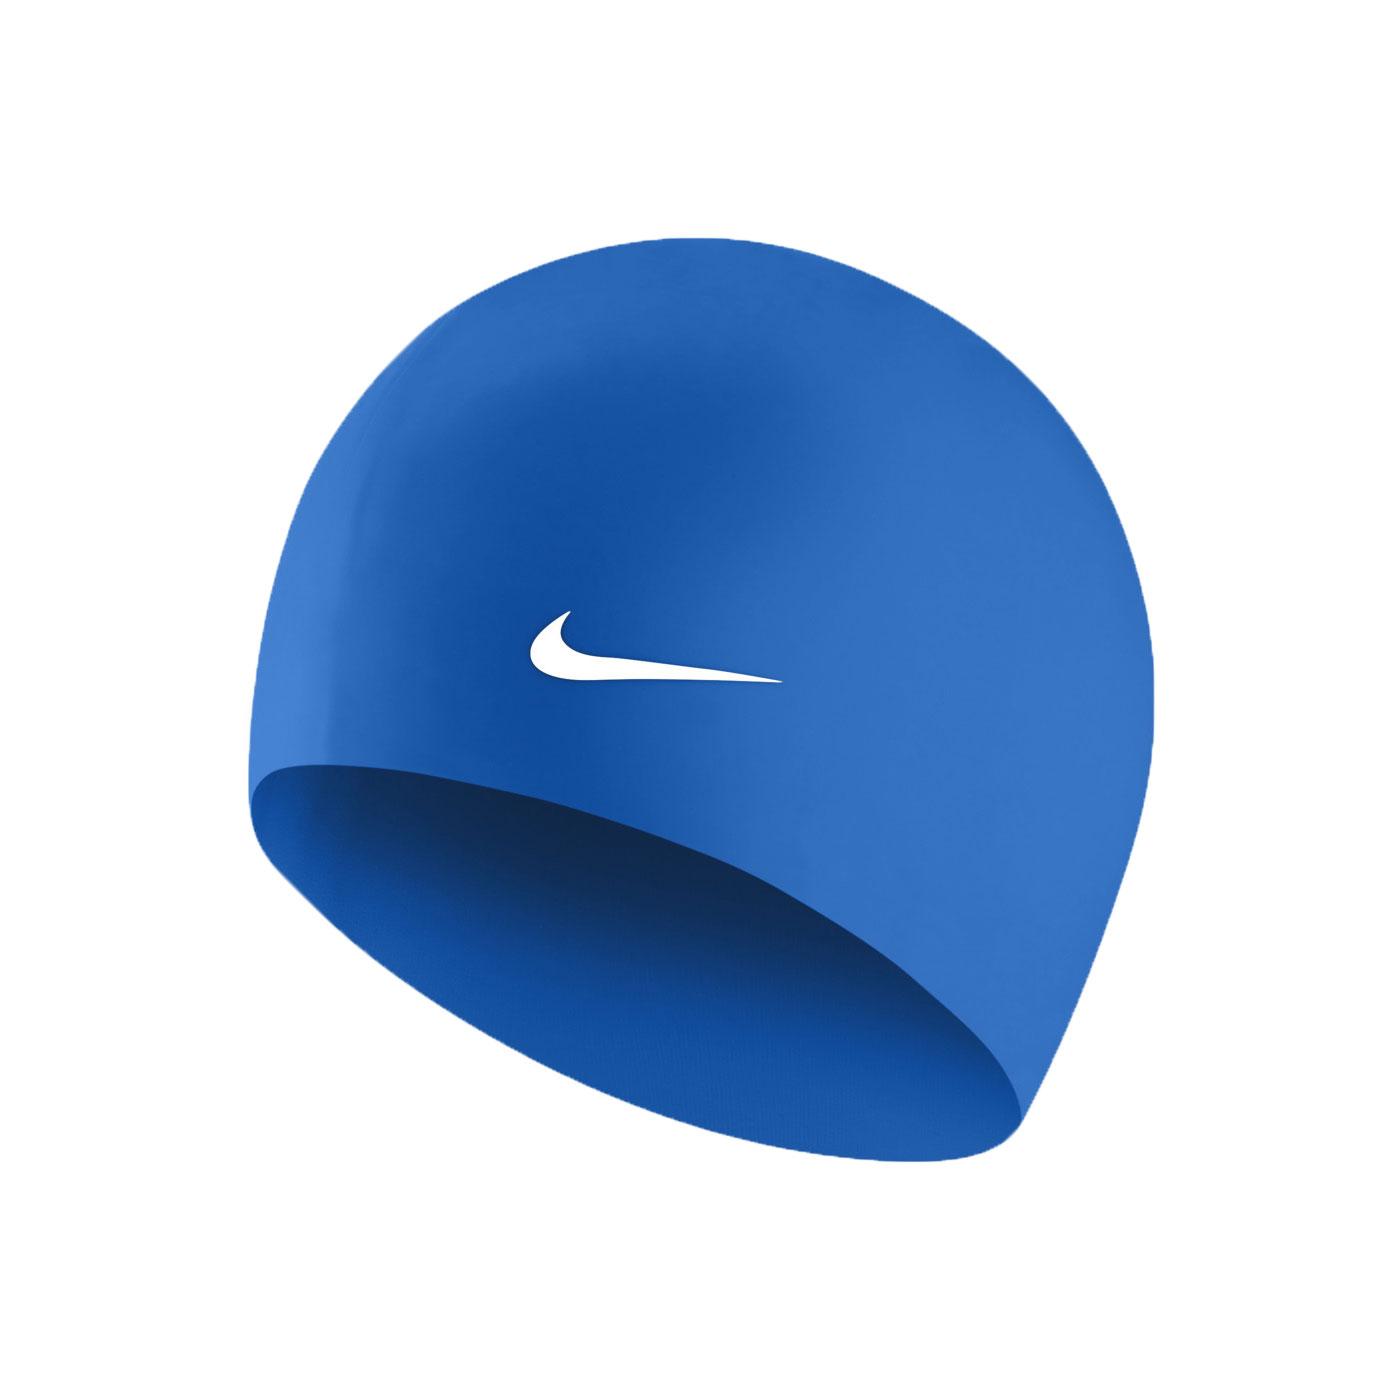 NIKE SWIM 成人矽膠泳帽 93060-494 - 藍白